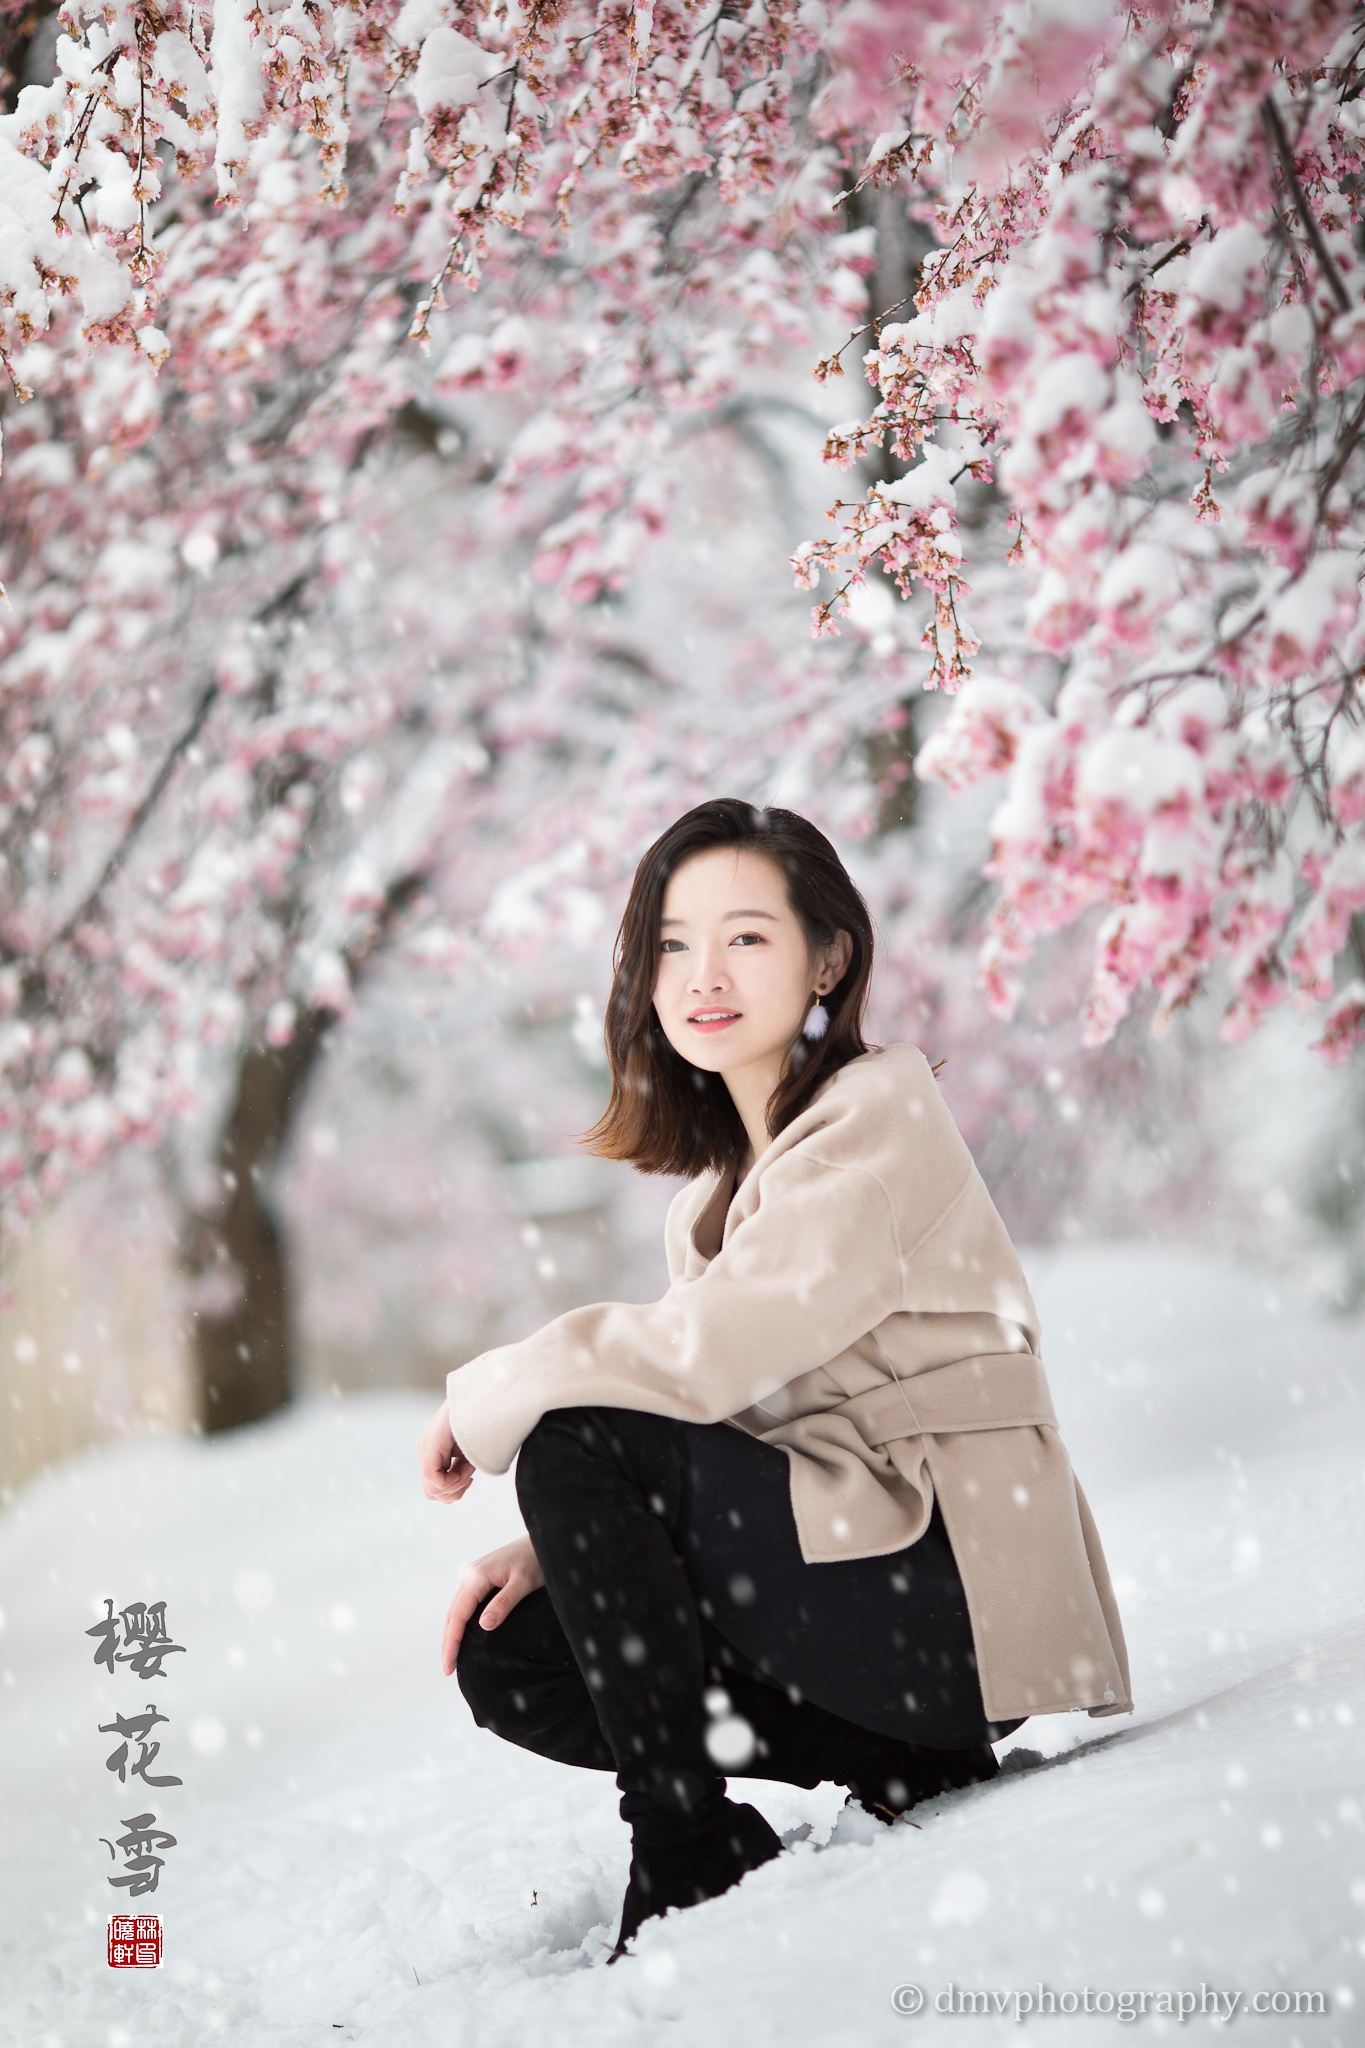 _D4_8329-snow